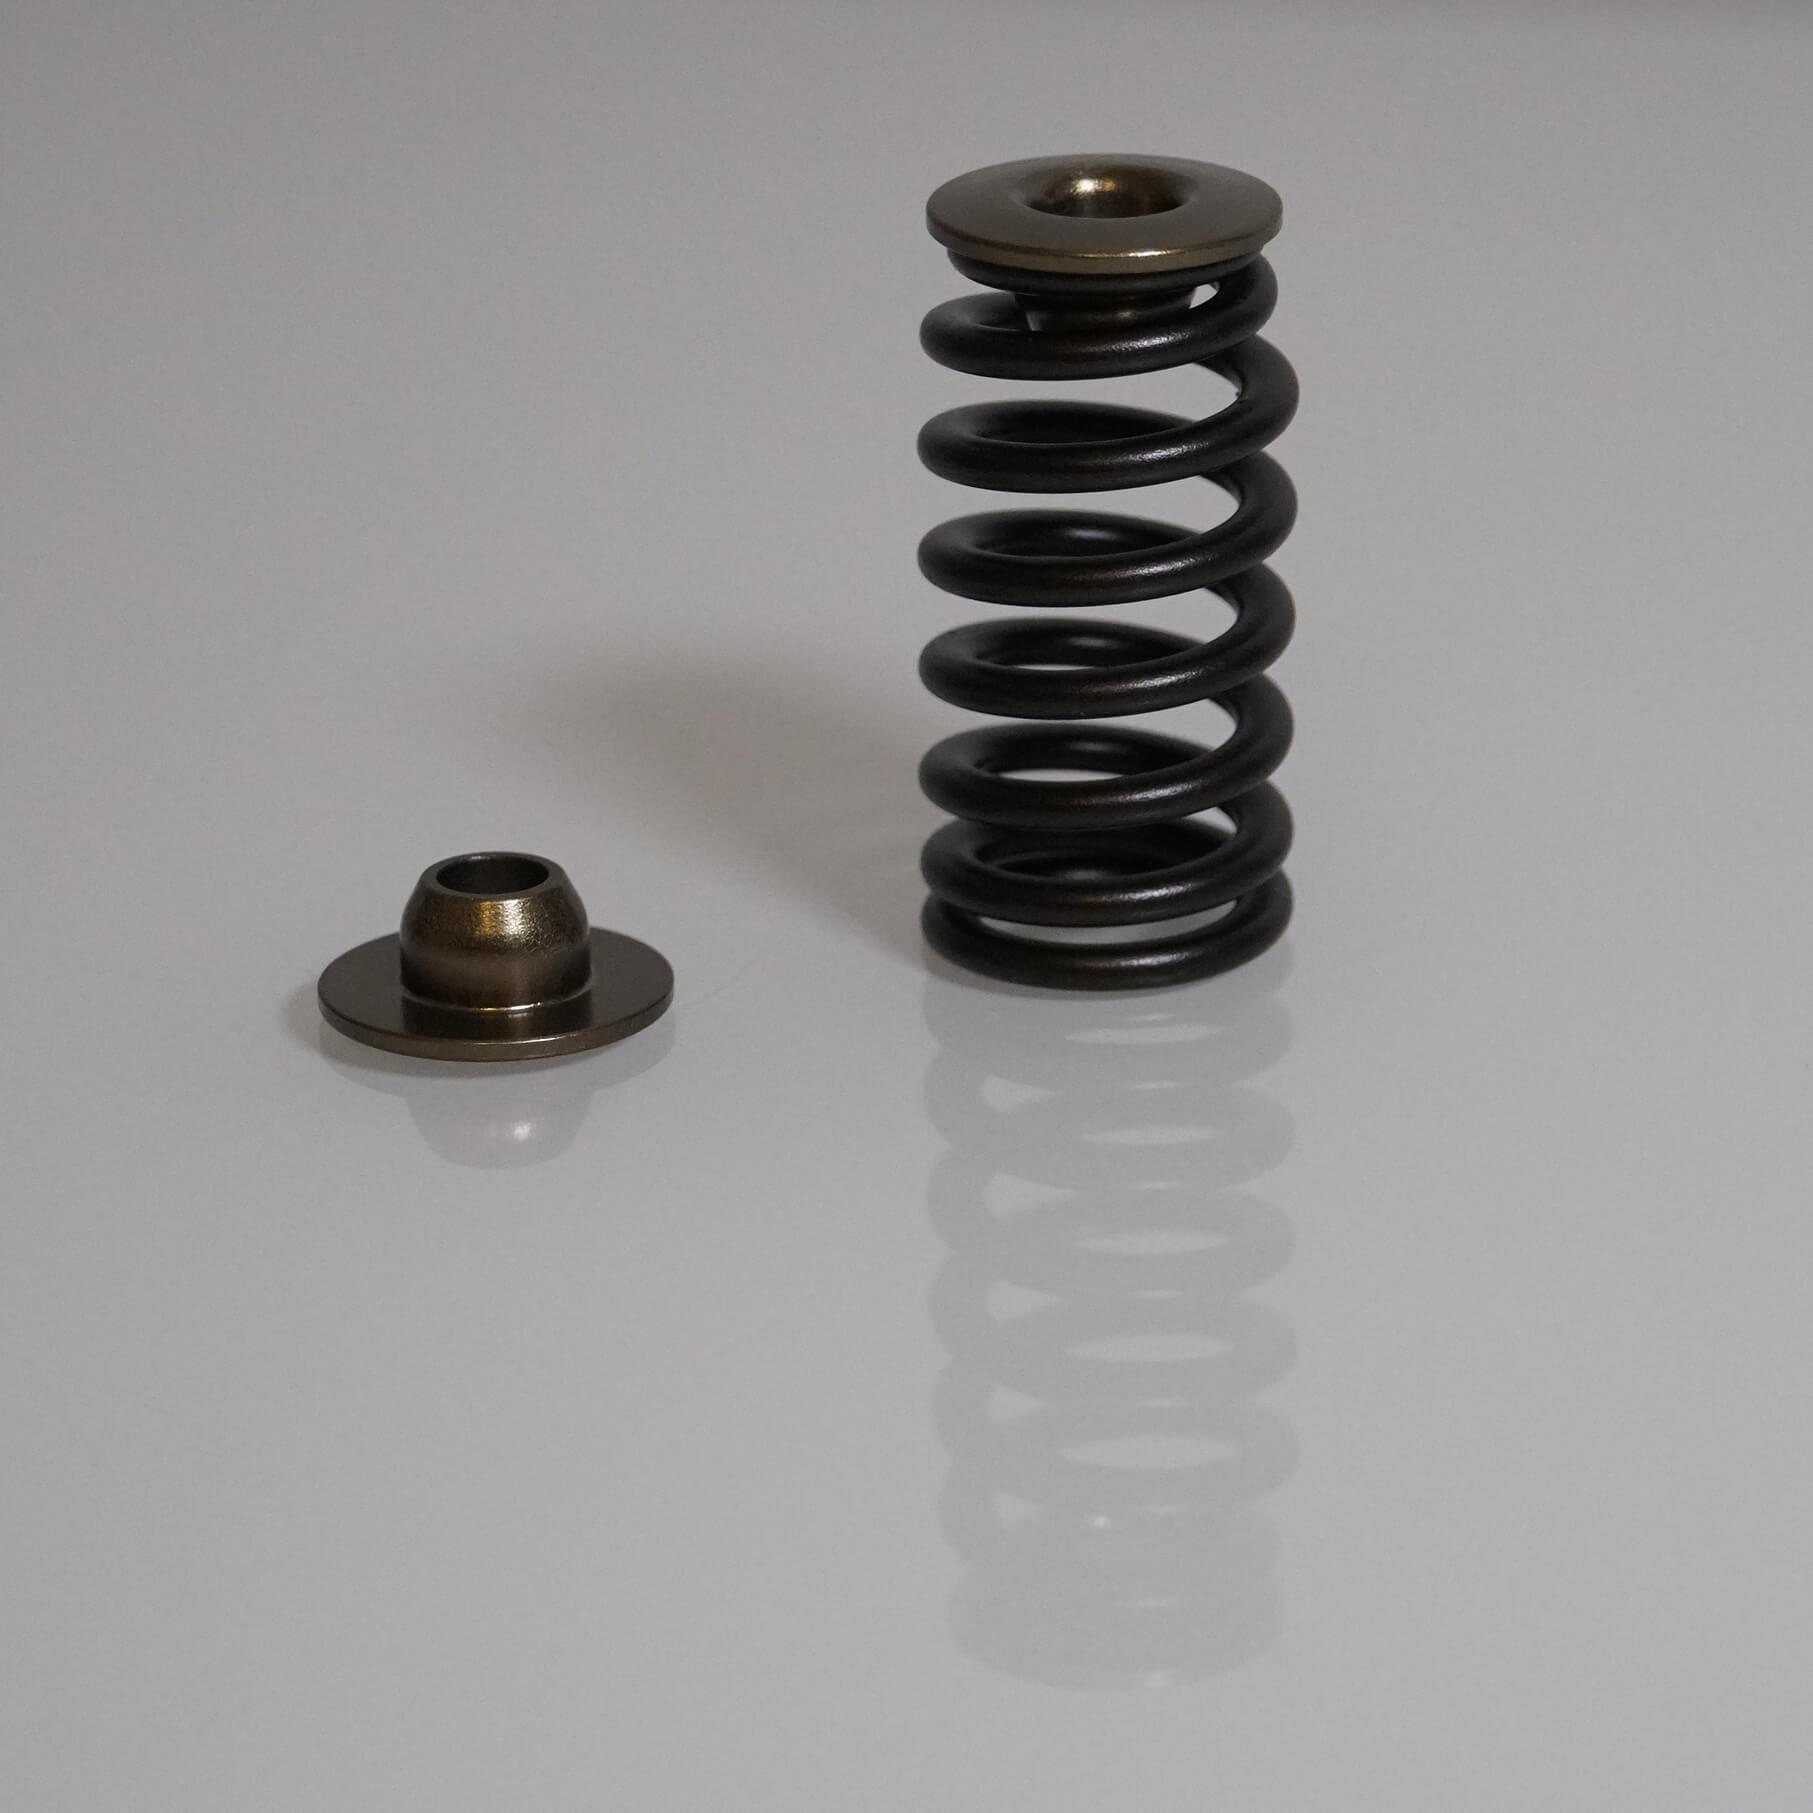 SRT TU5J4 / TU5JP4 16v special valve spring setup (hydraulic lifters)